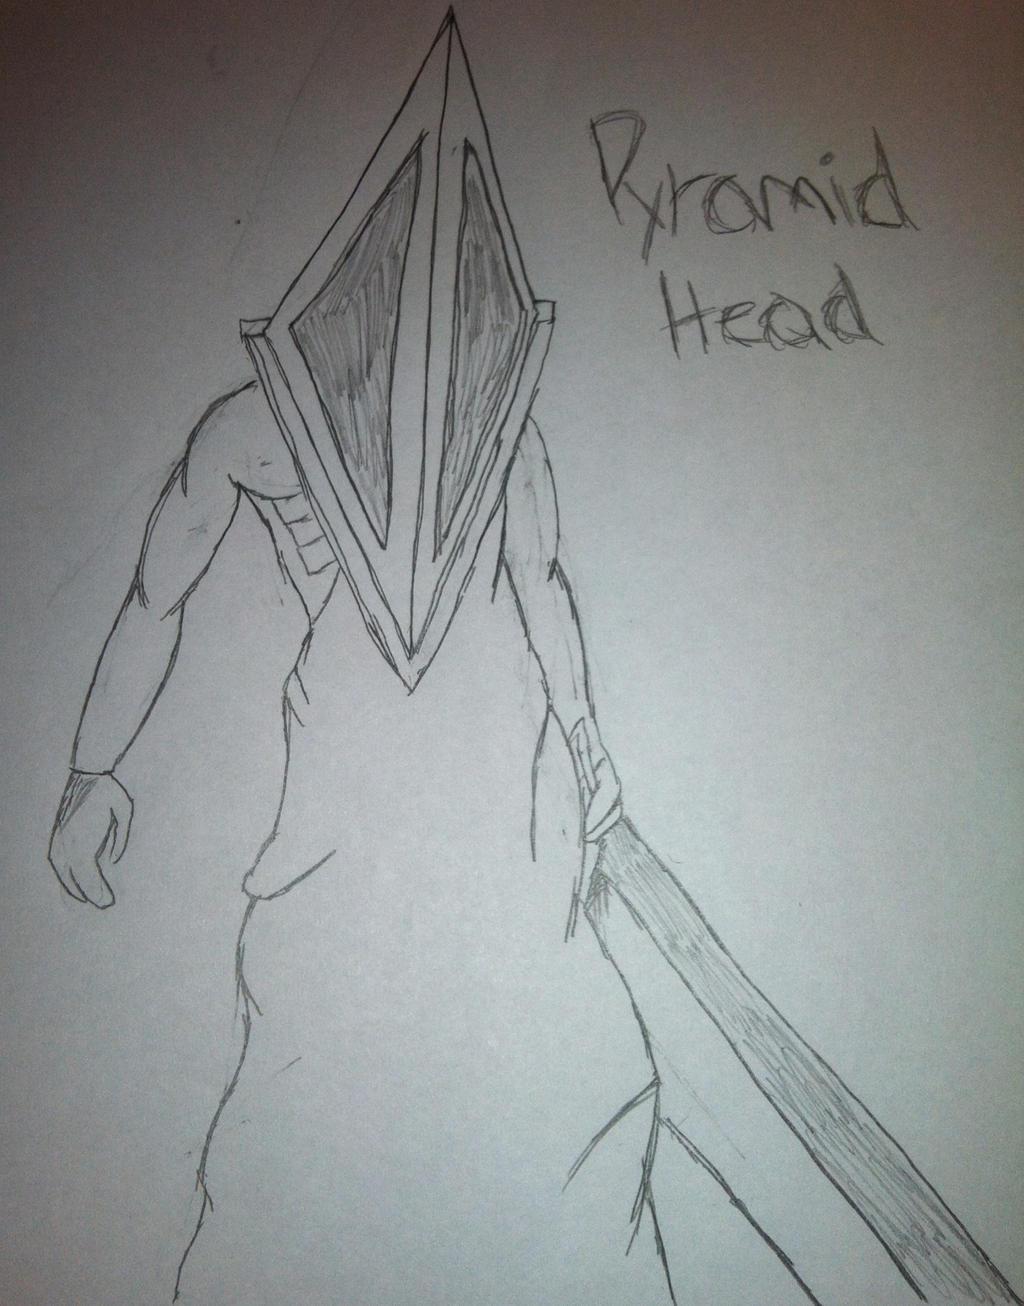 Pyramid Head 3 by DeathsLittleBirdie